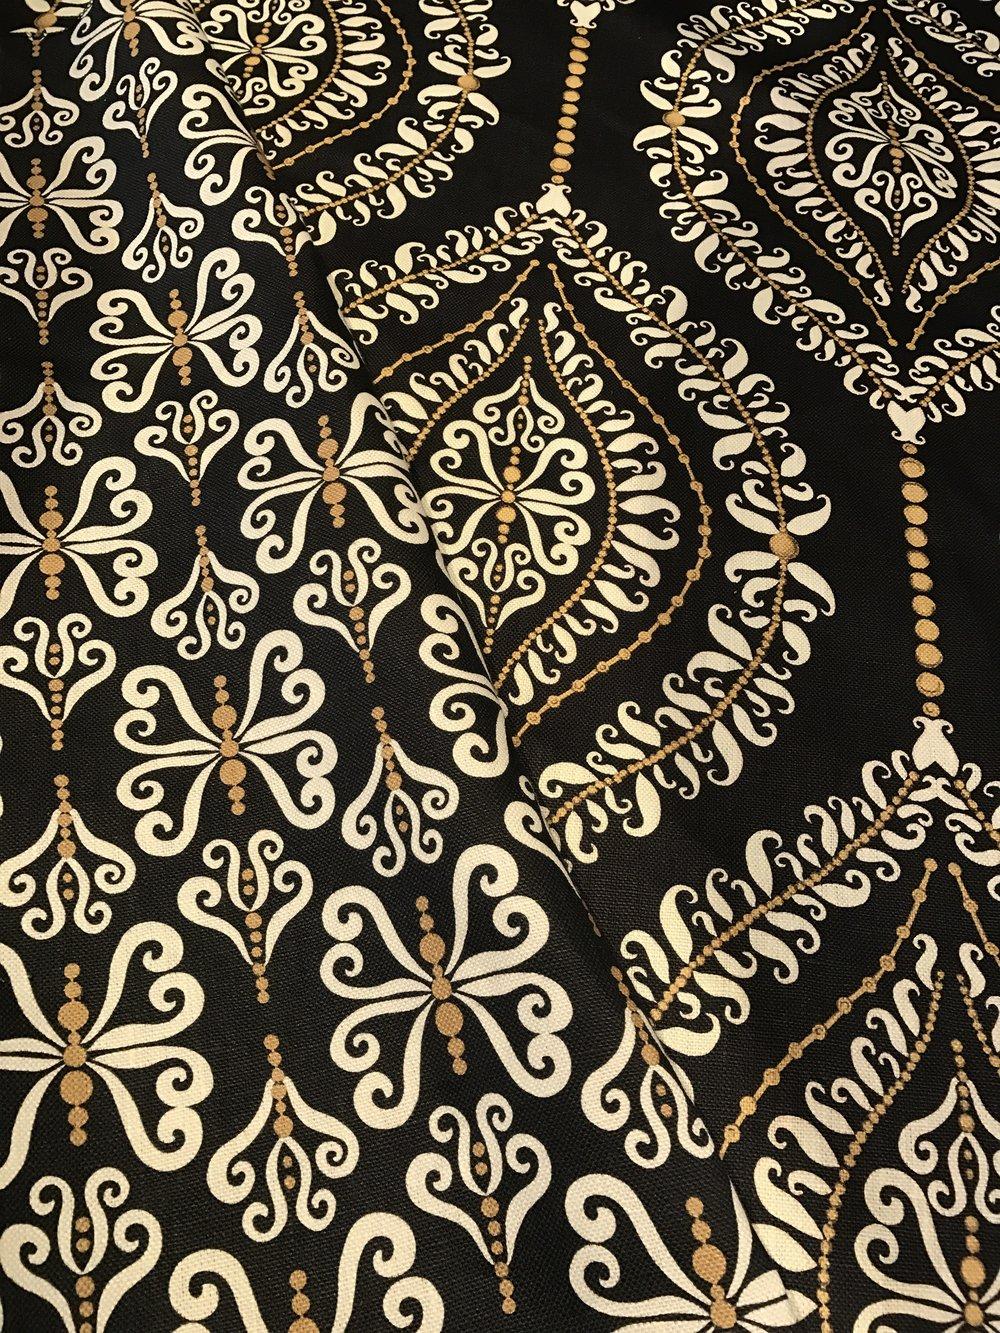 Curls & Pearls / Butterfly Curls fabrics